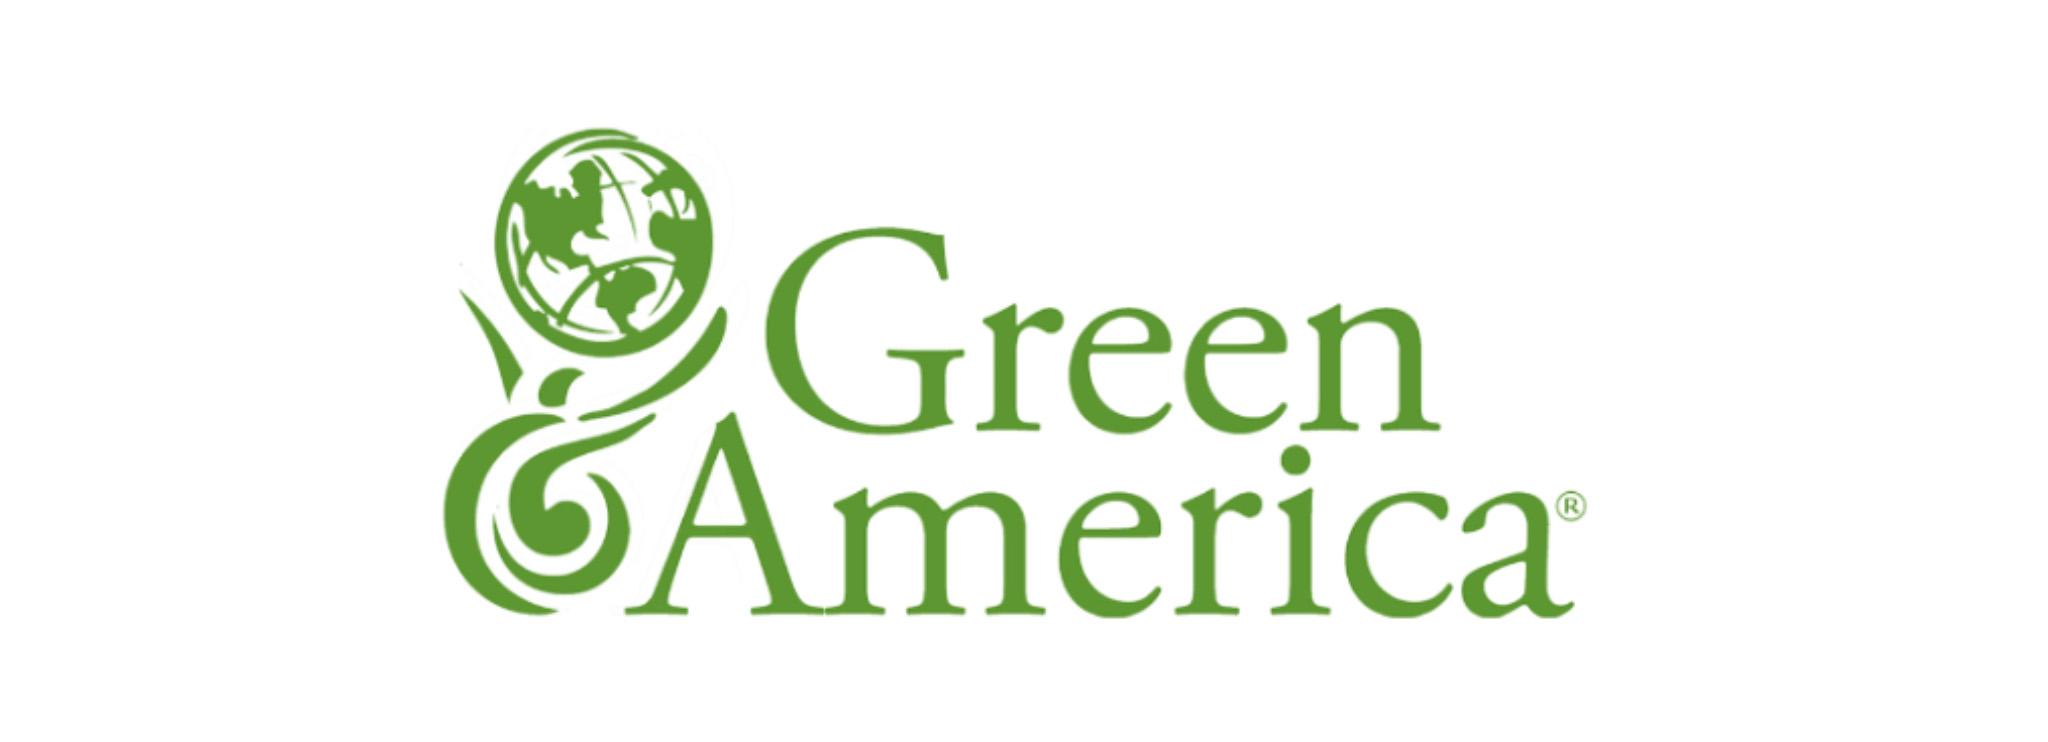 Mogalixe green america member